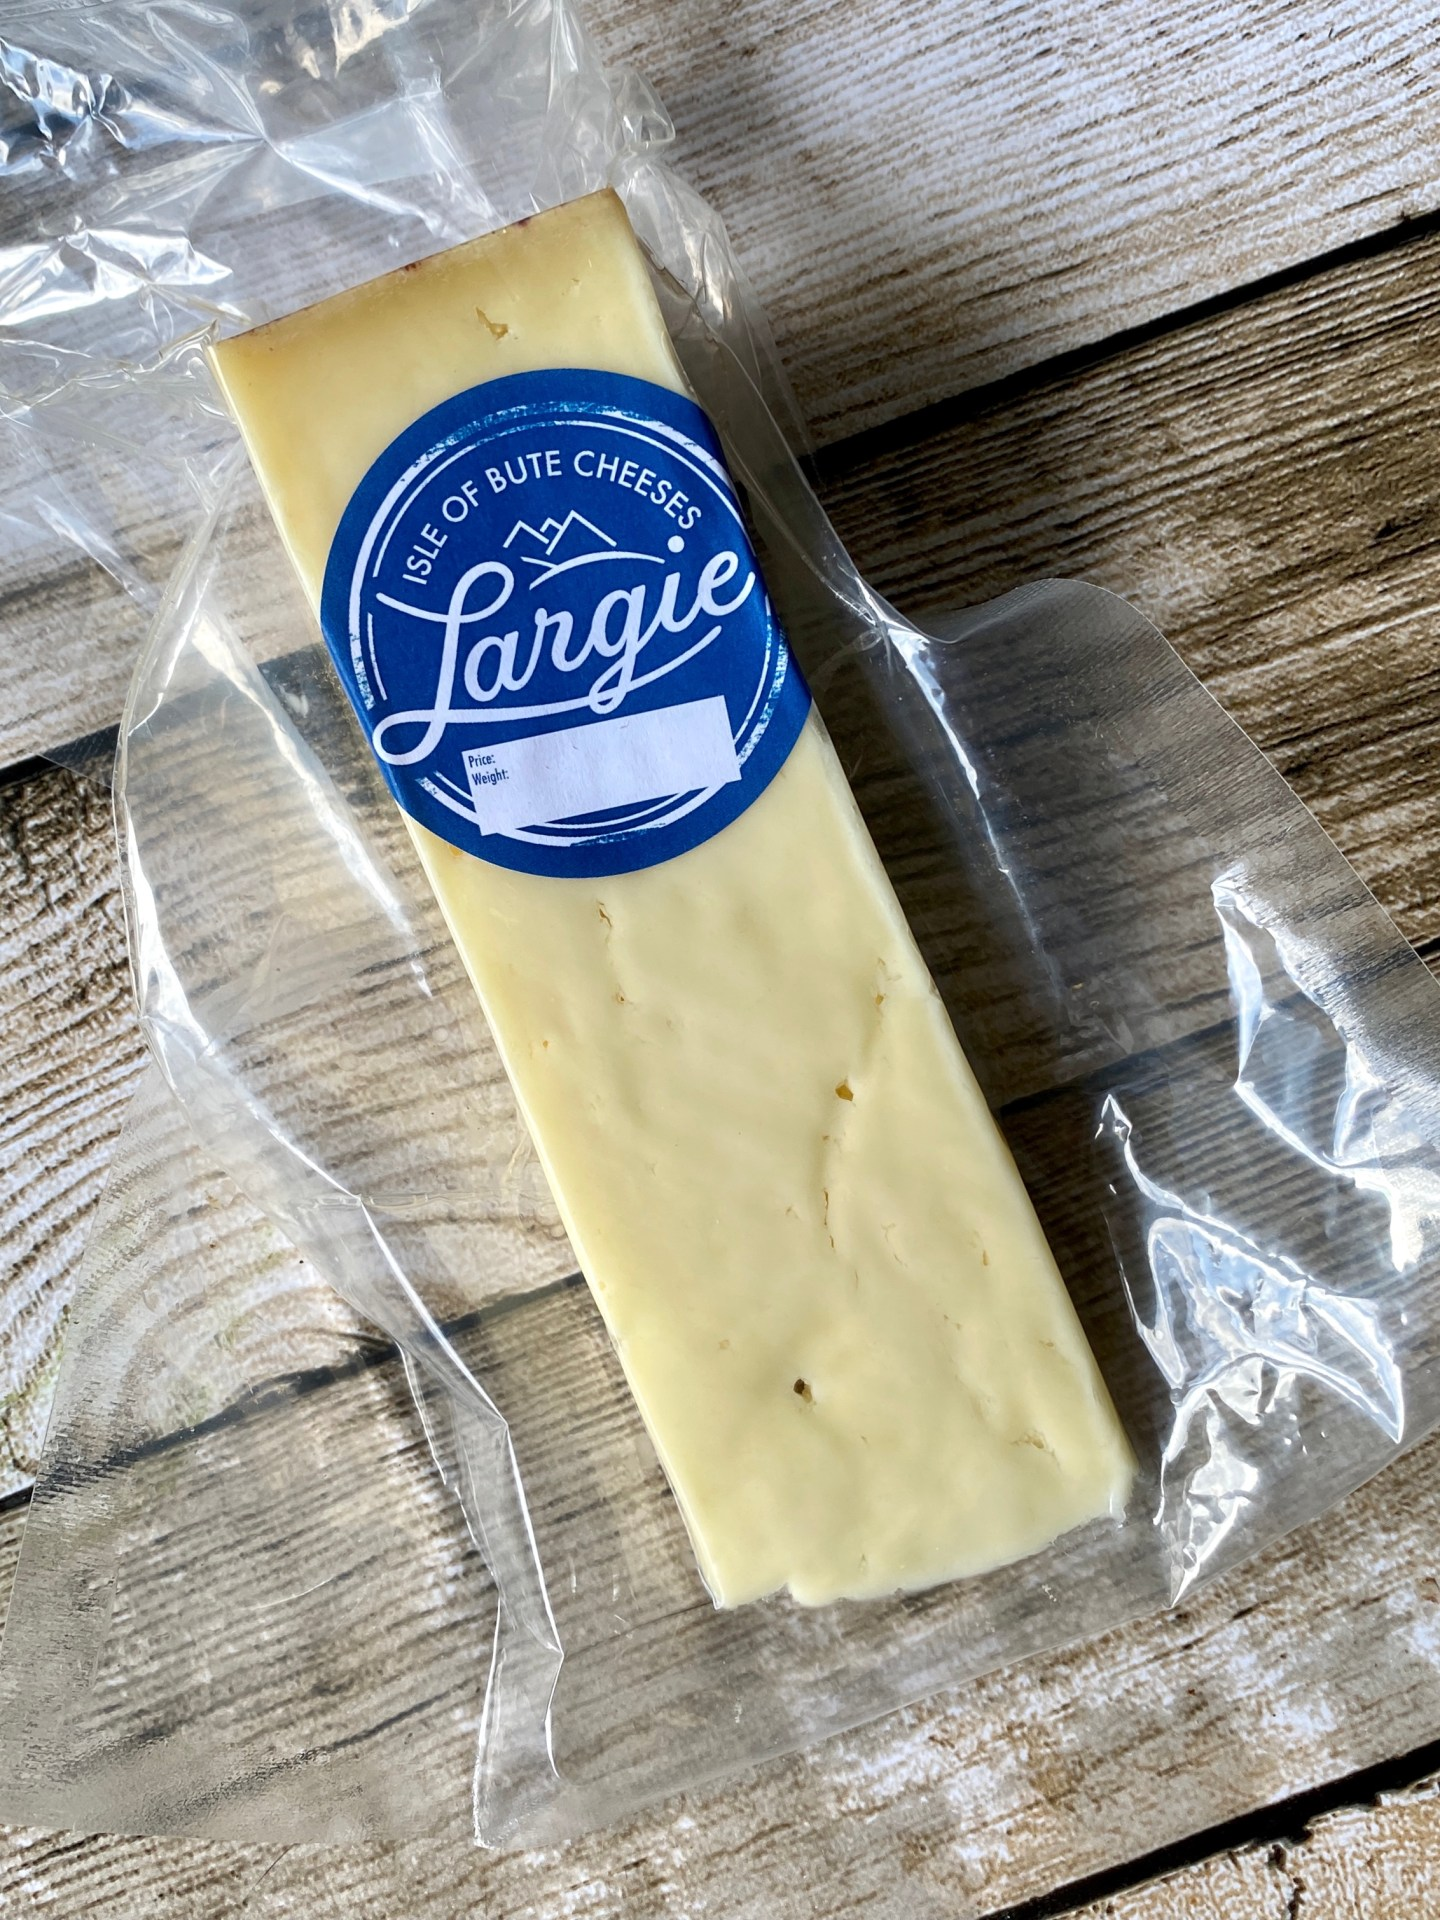 visit bute kitchen box cheese